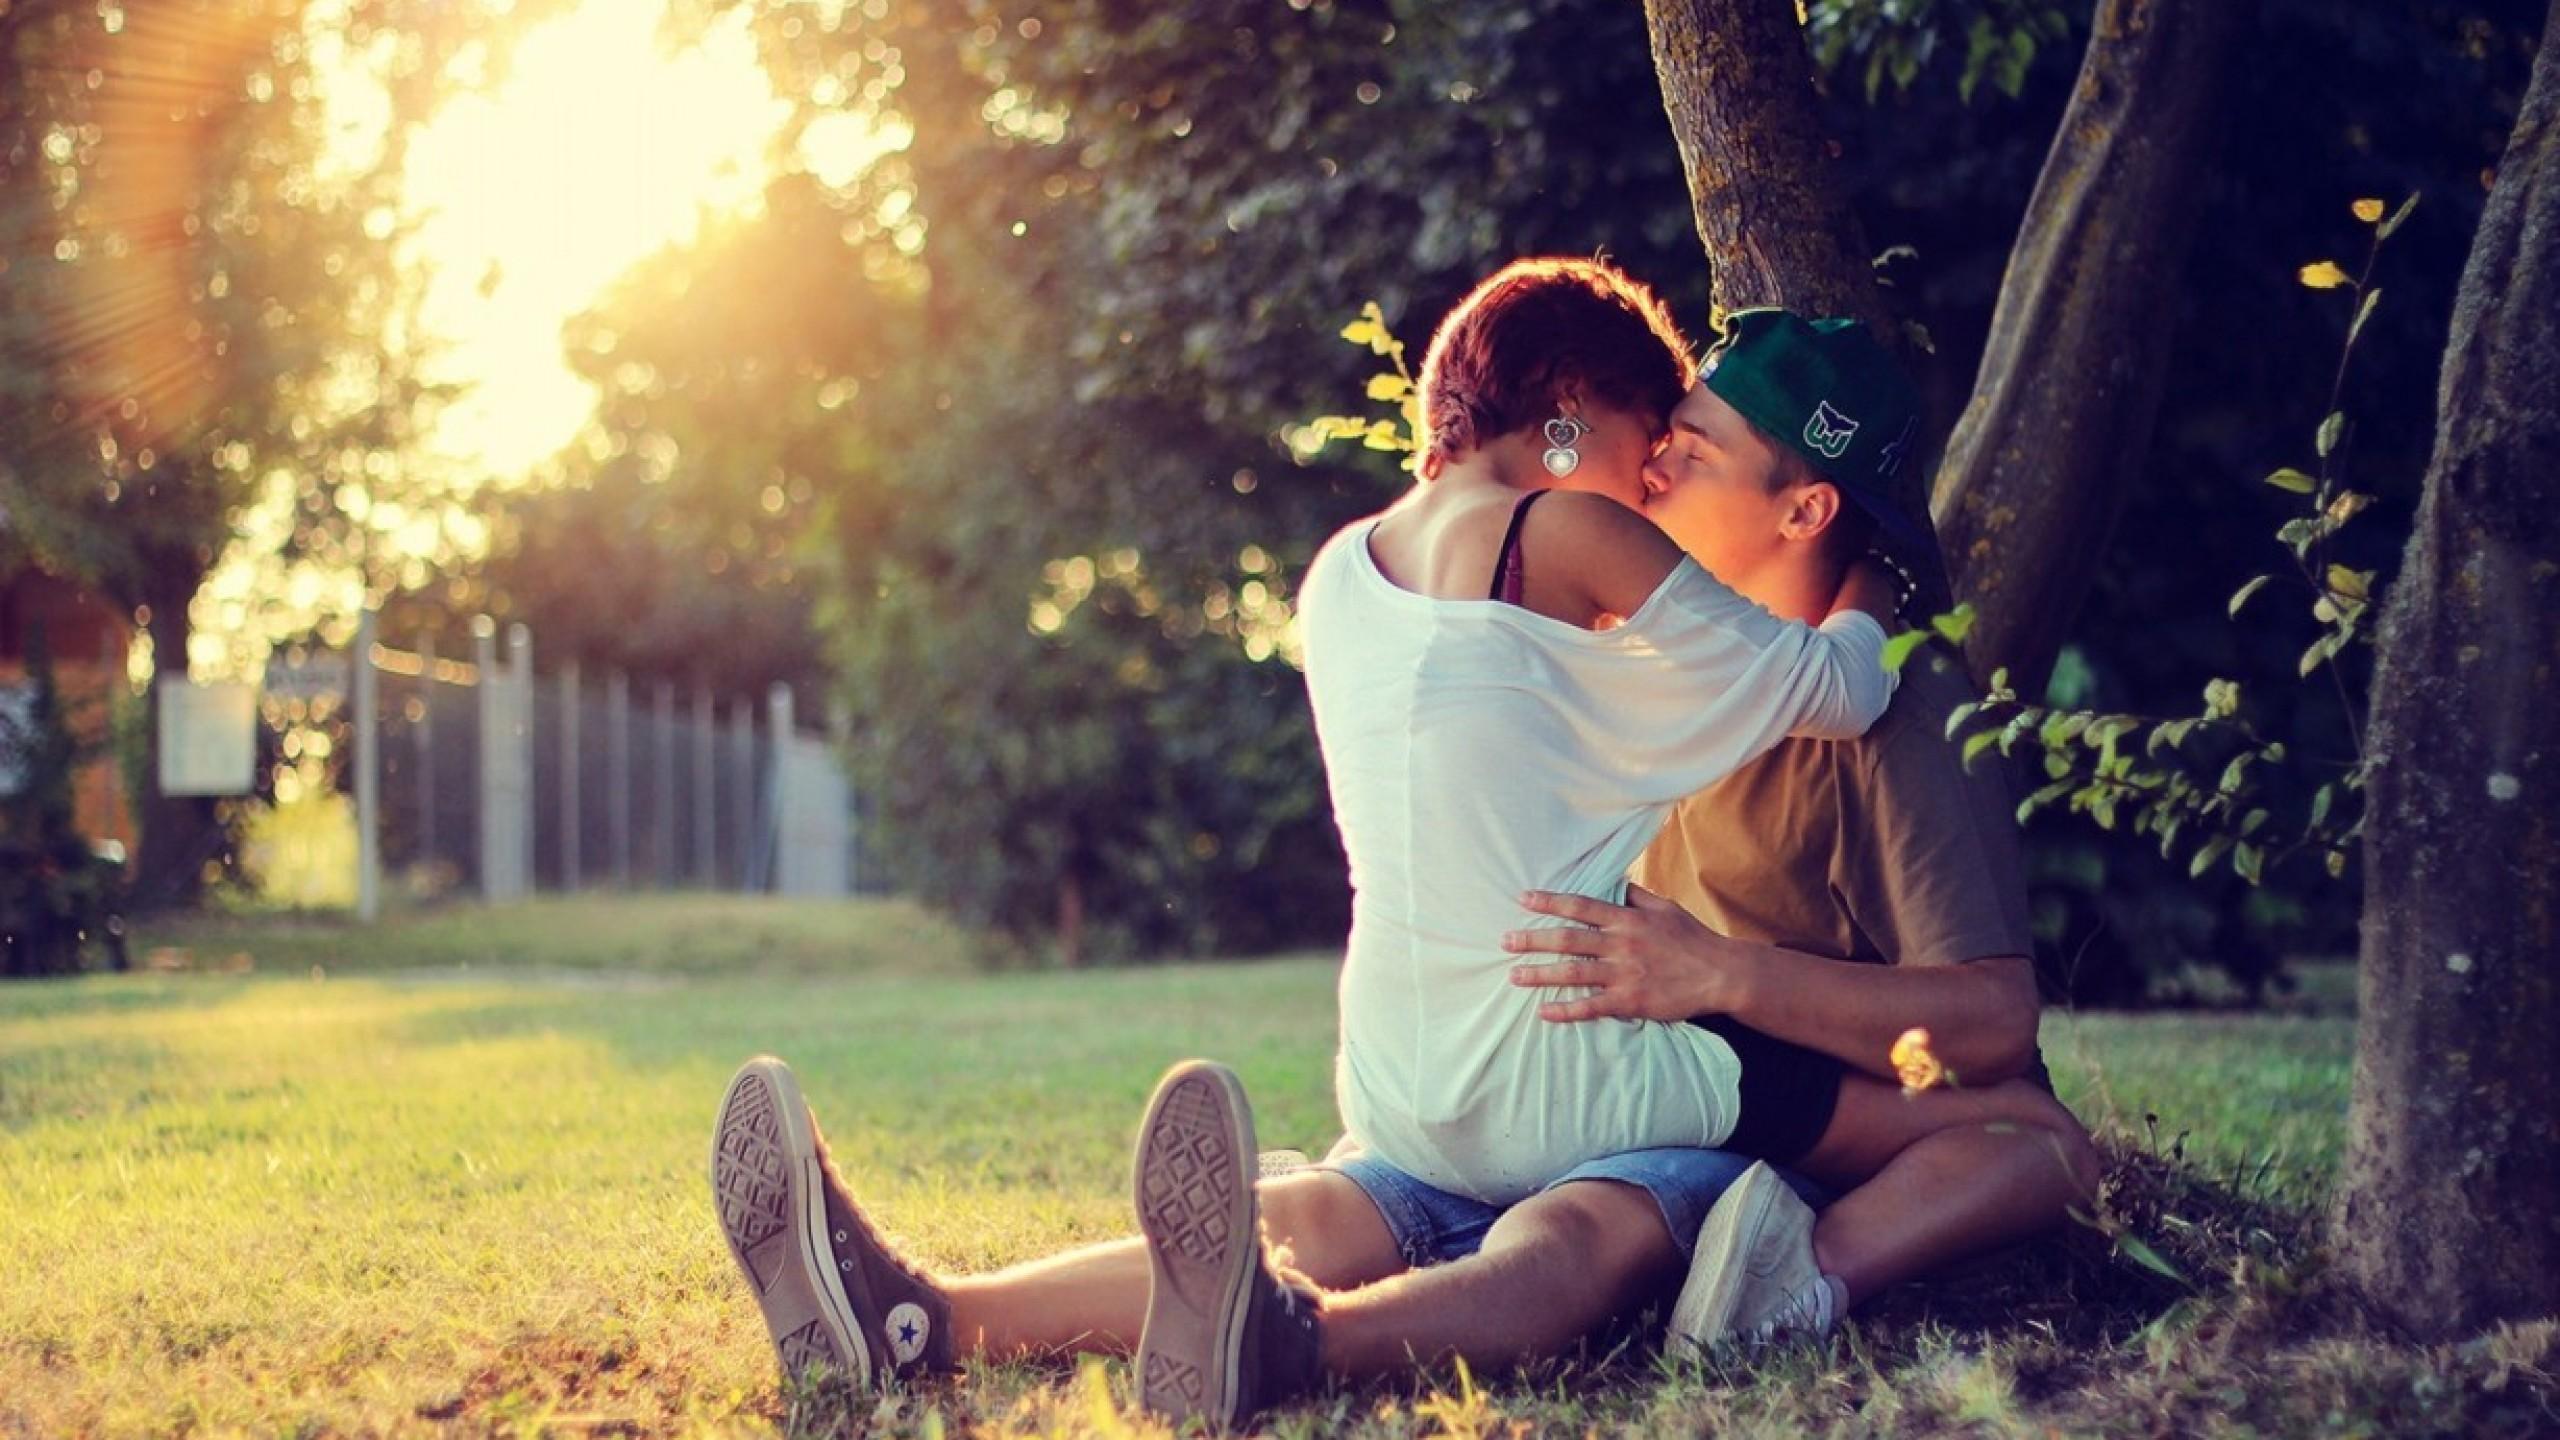 kissing couple hd wallpapers, hug kiss scenes of love couple 2560x1440